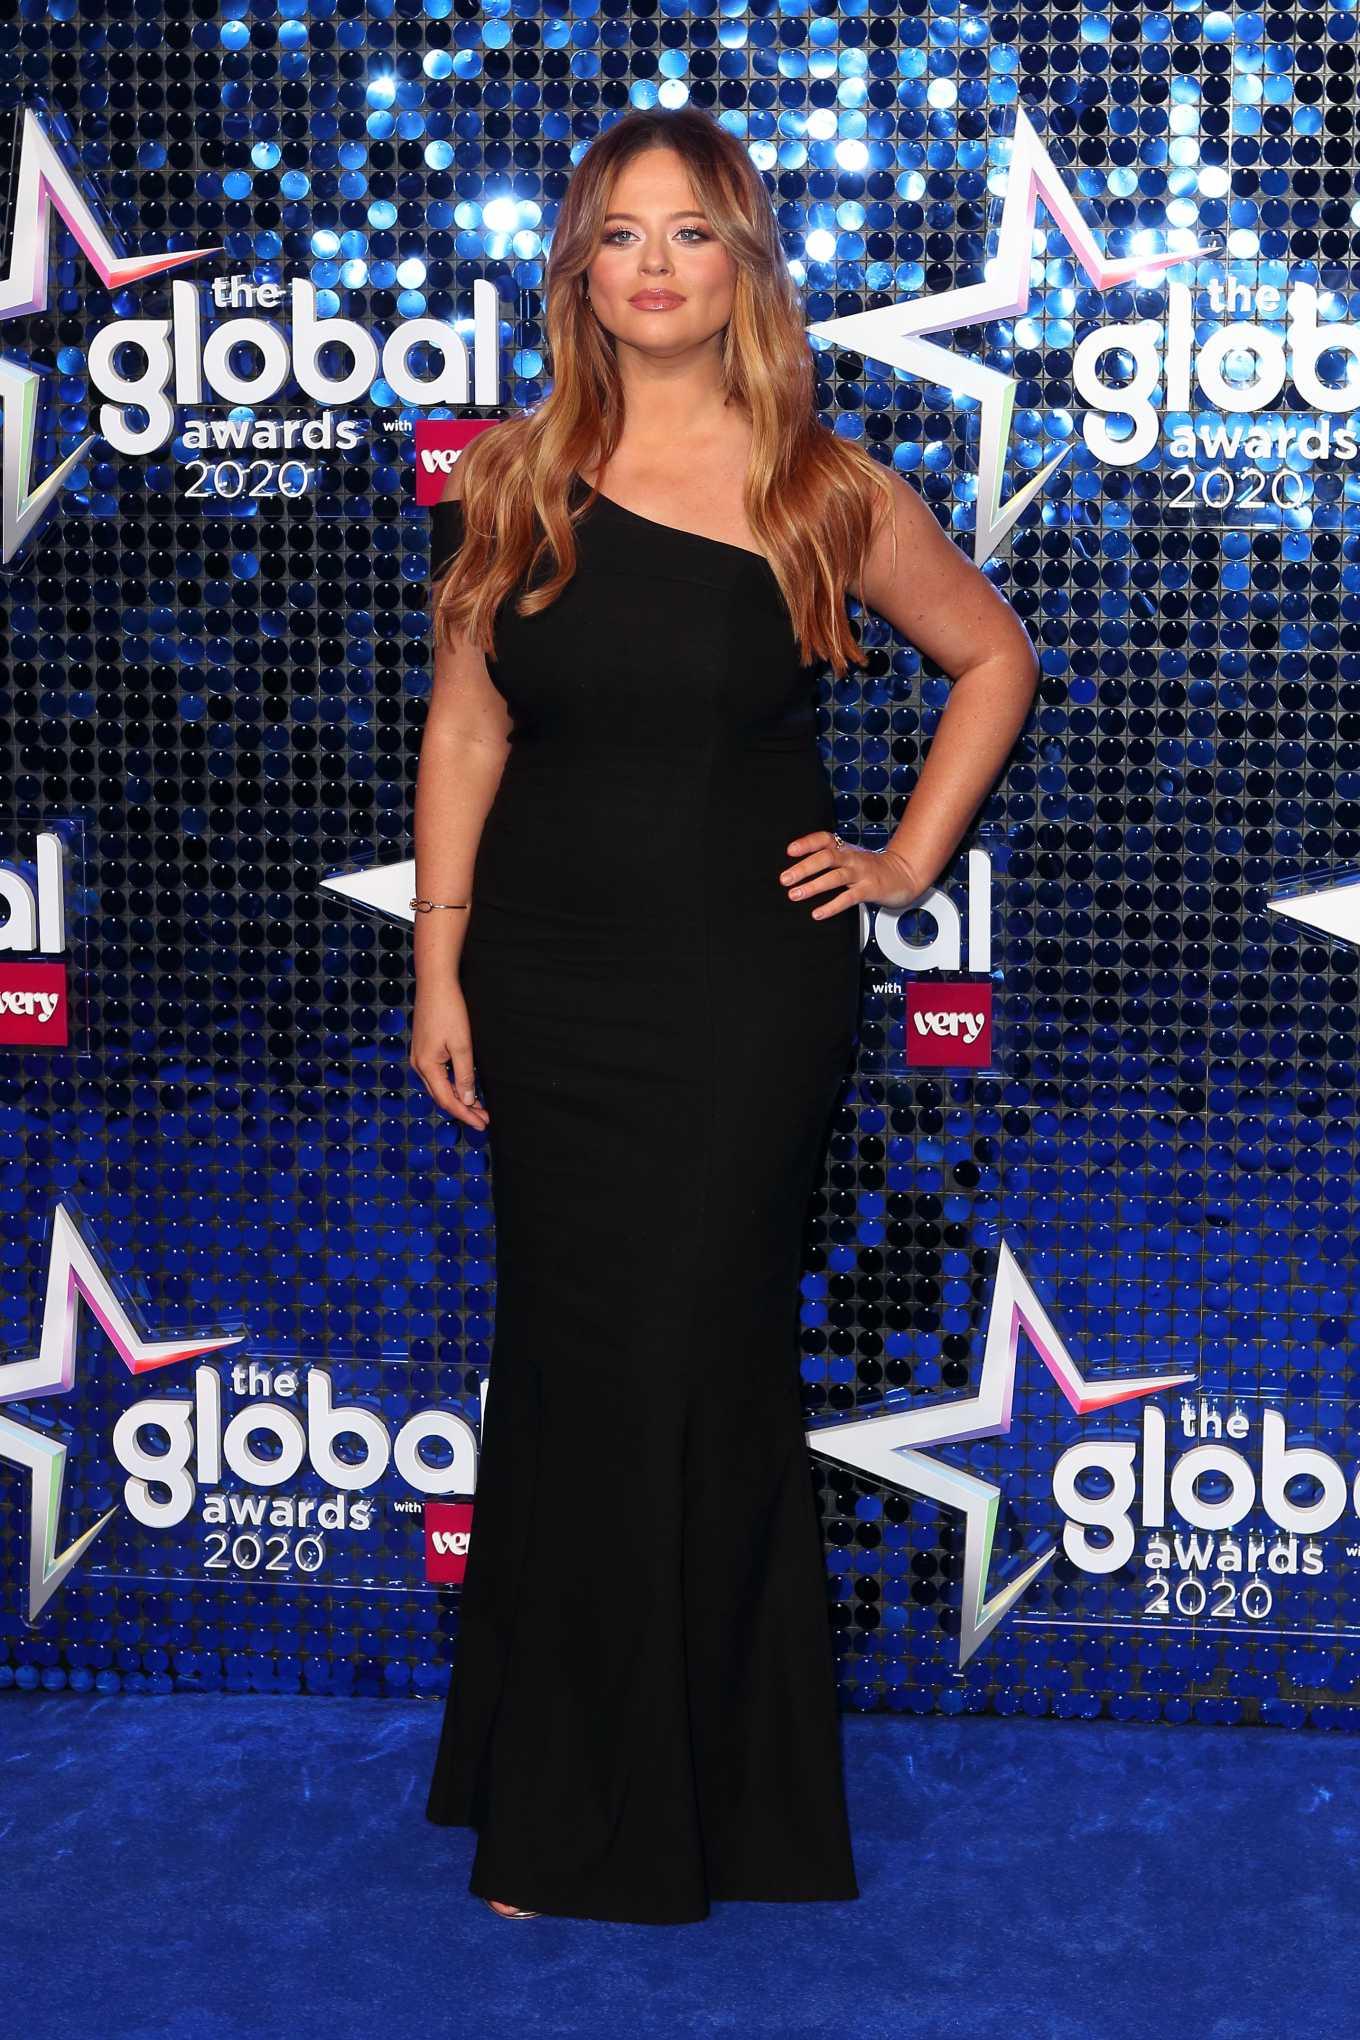 Emily Atack - The Global Awards 2020 in London